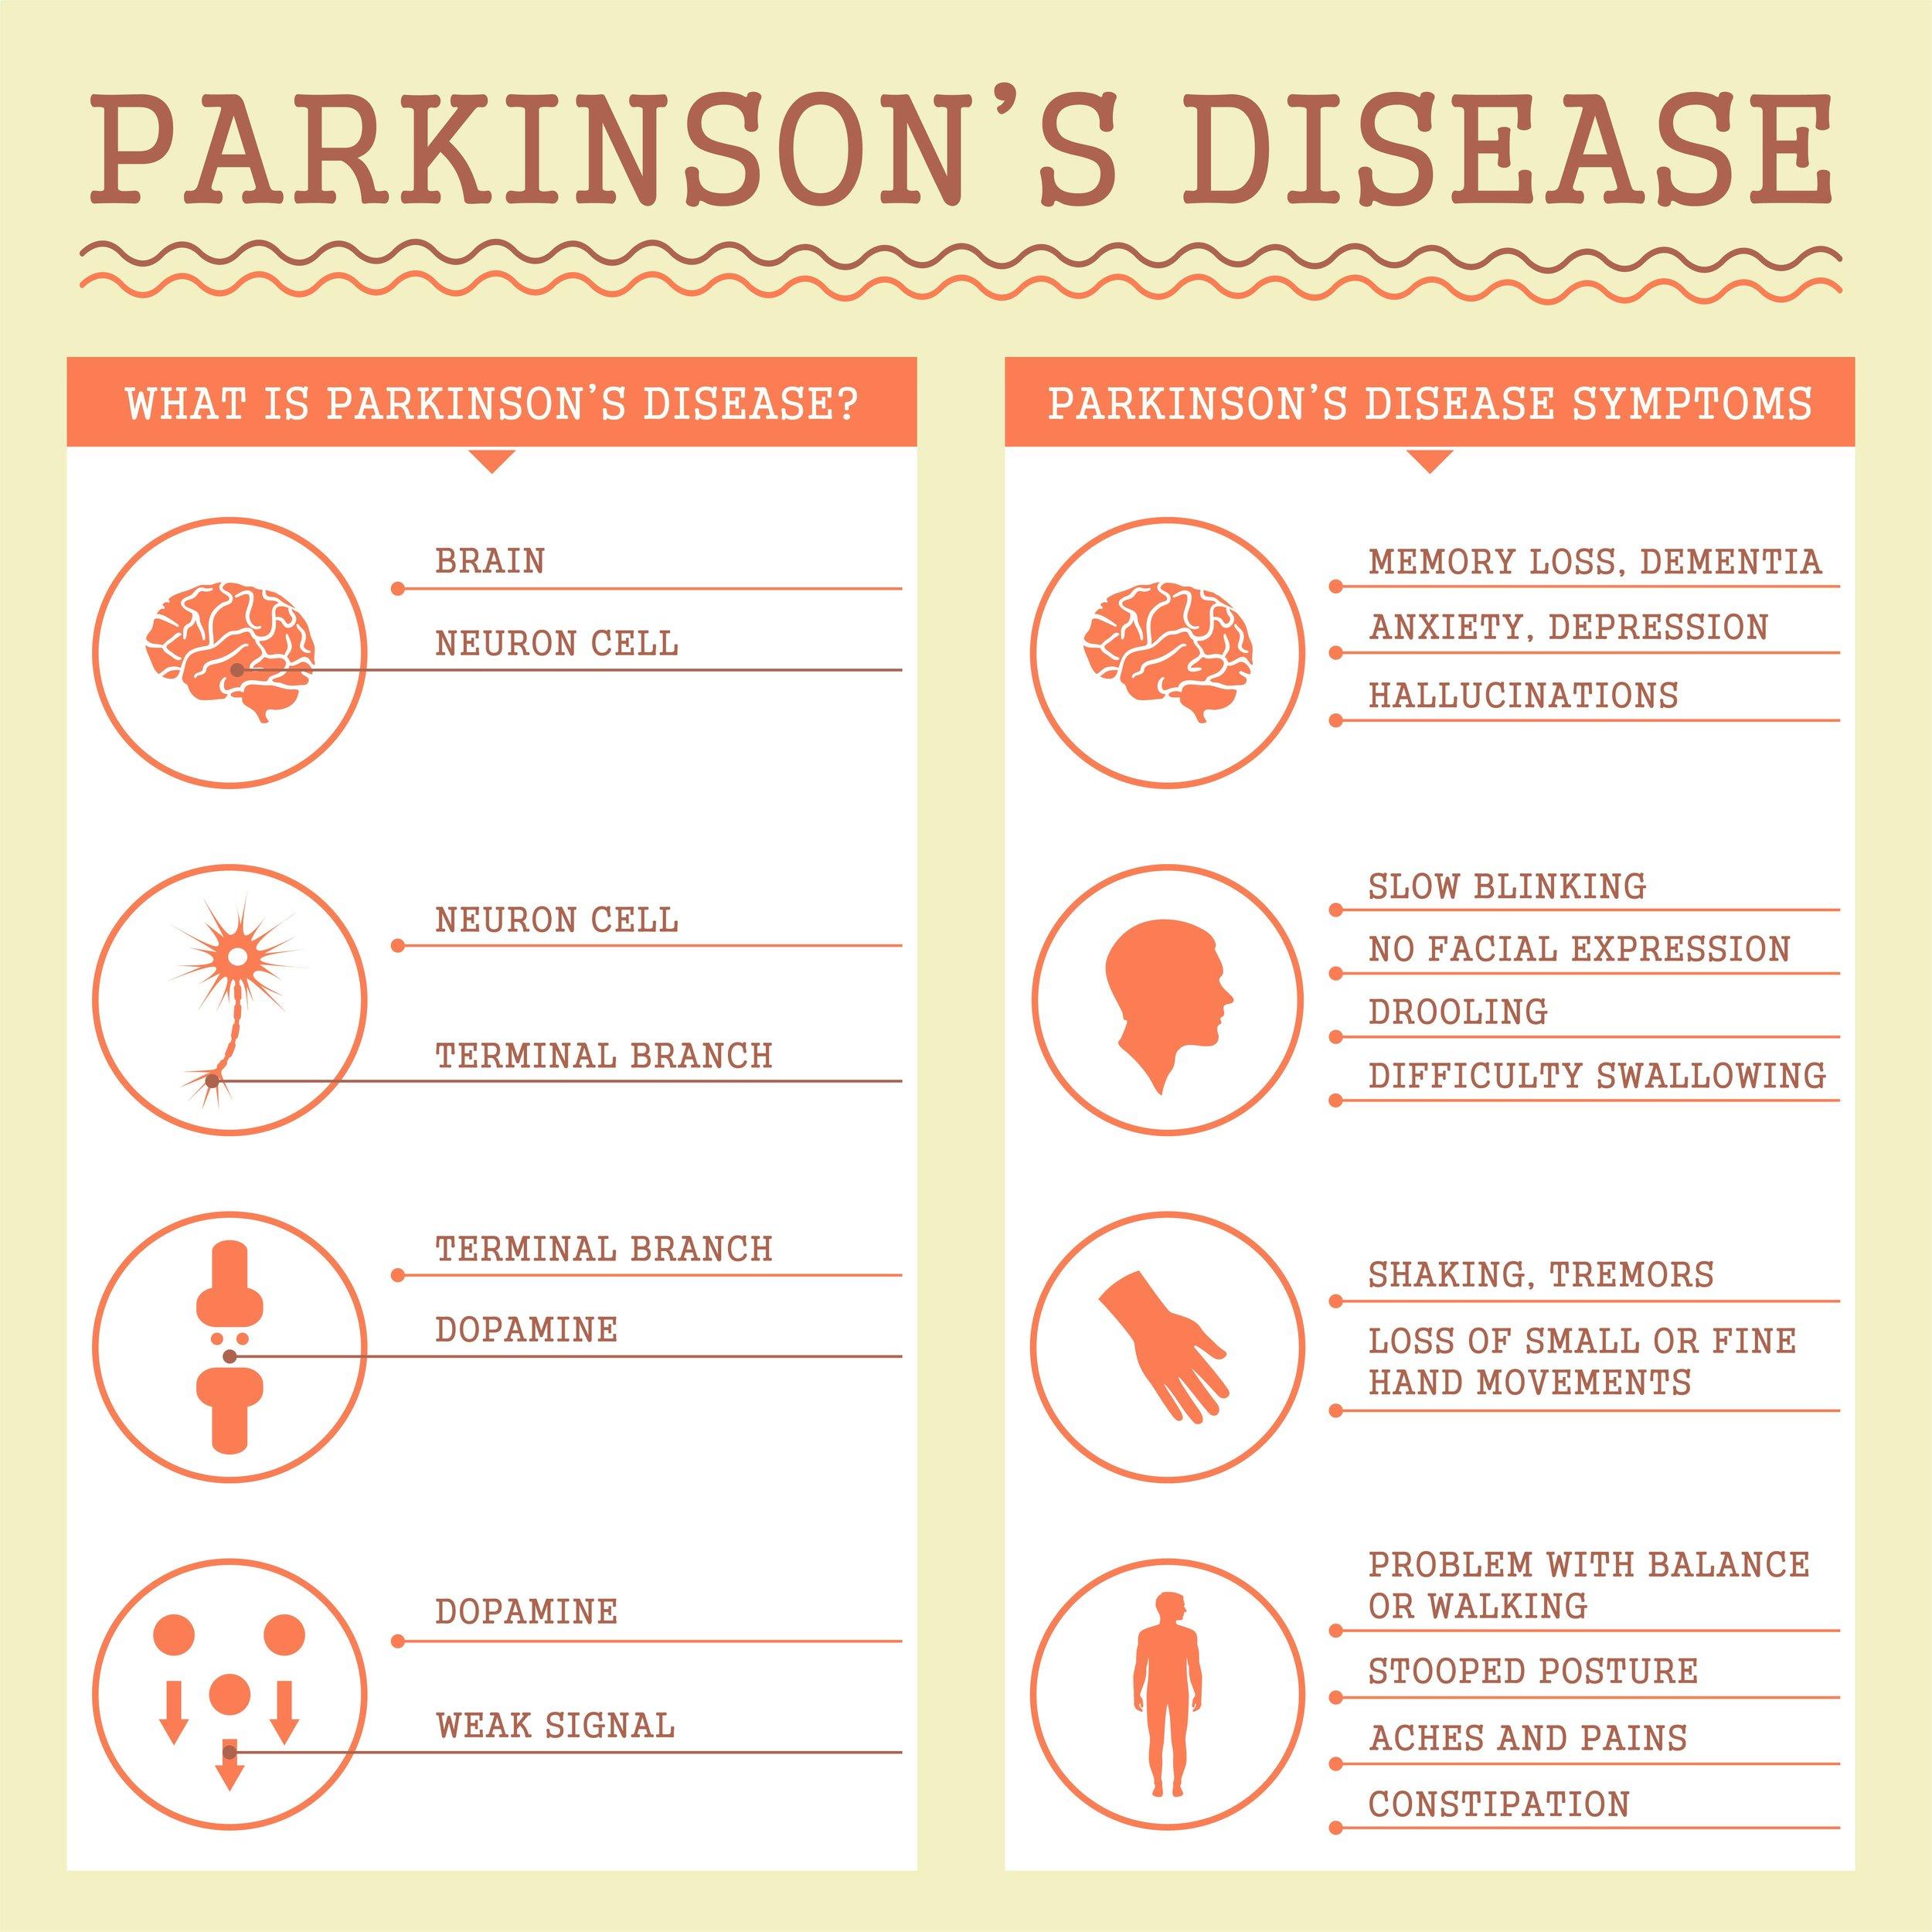 ParkinsonsInfoGraphic.jpg